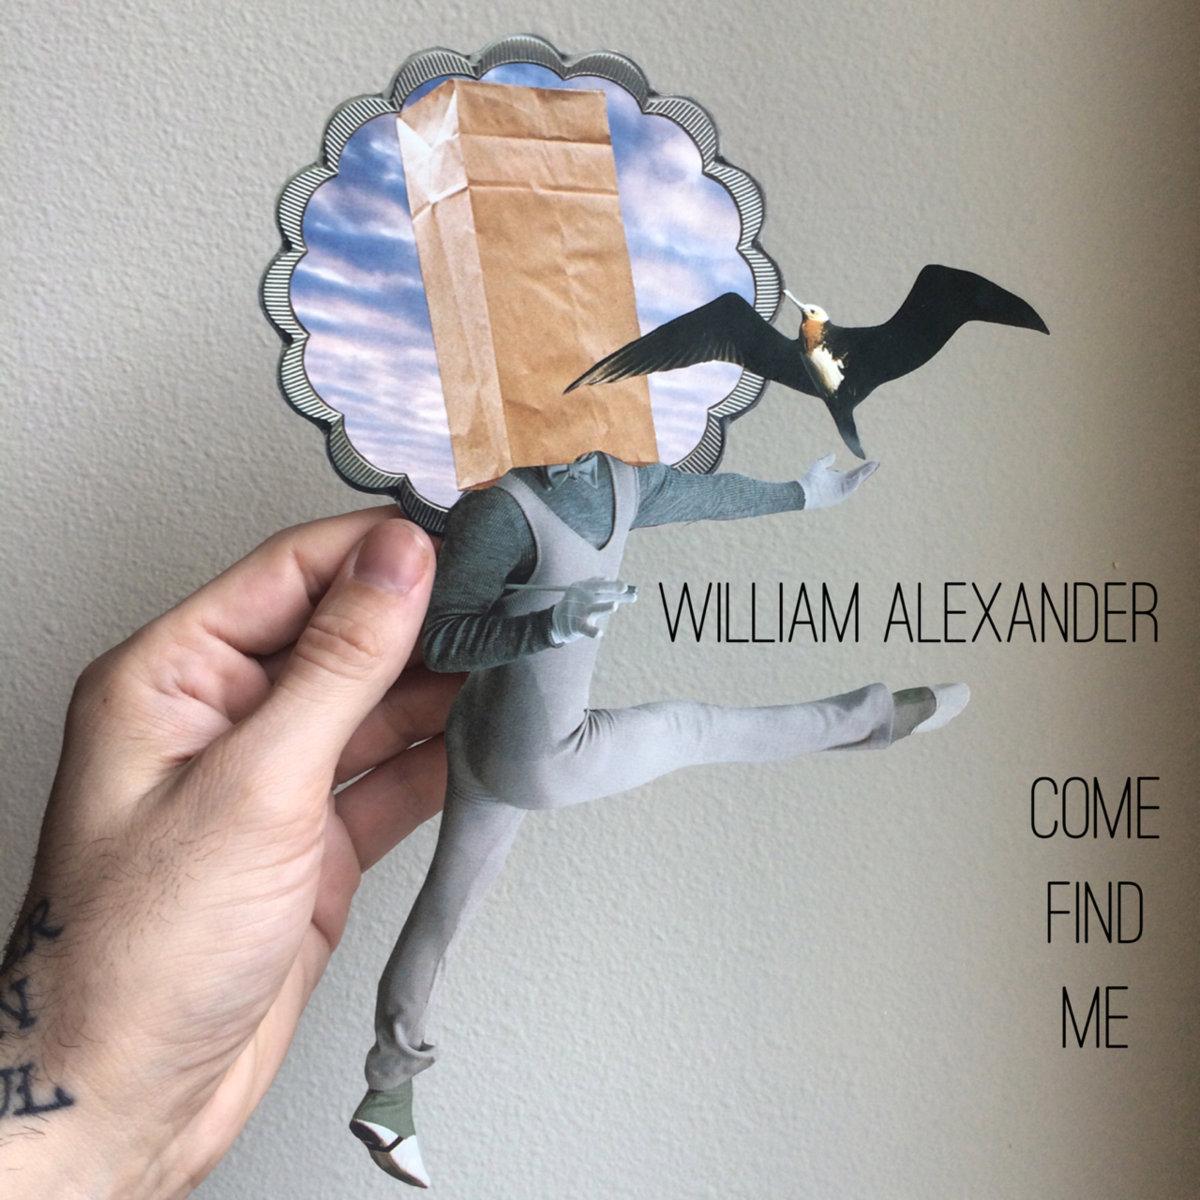 william-alexander-come-find-me.jpg